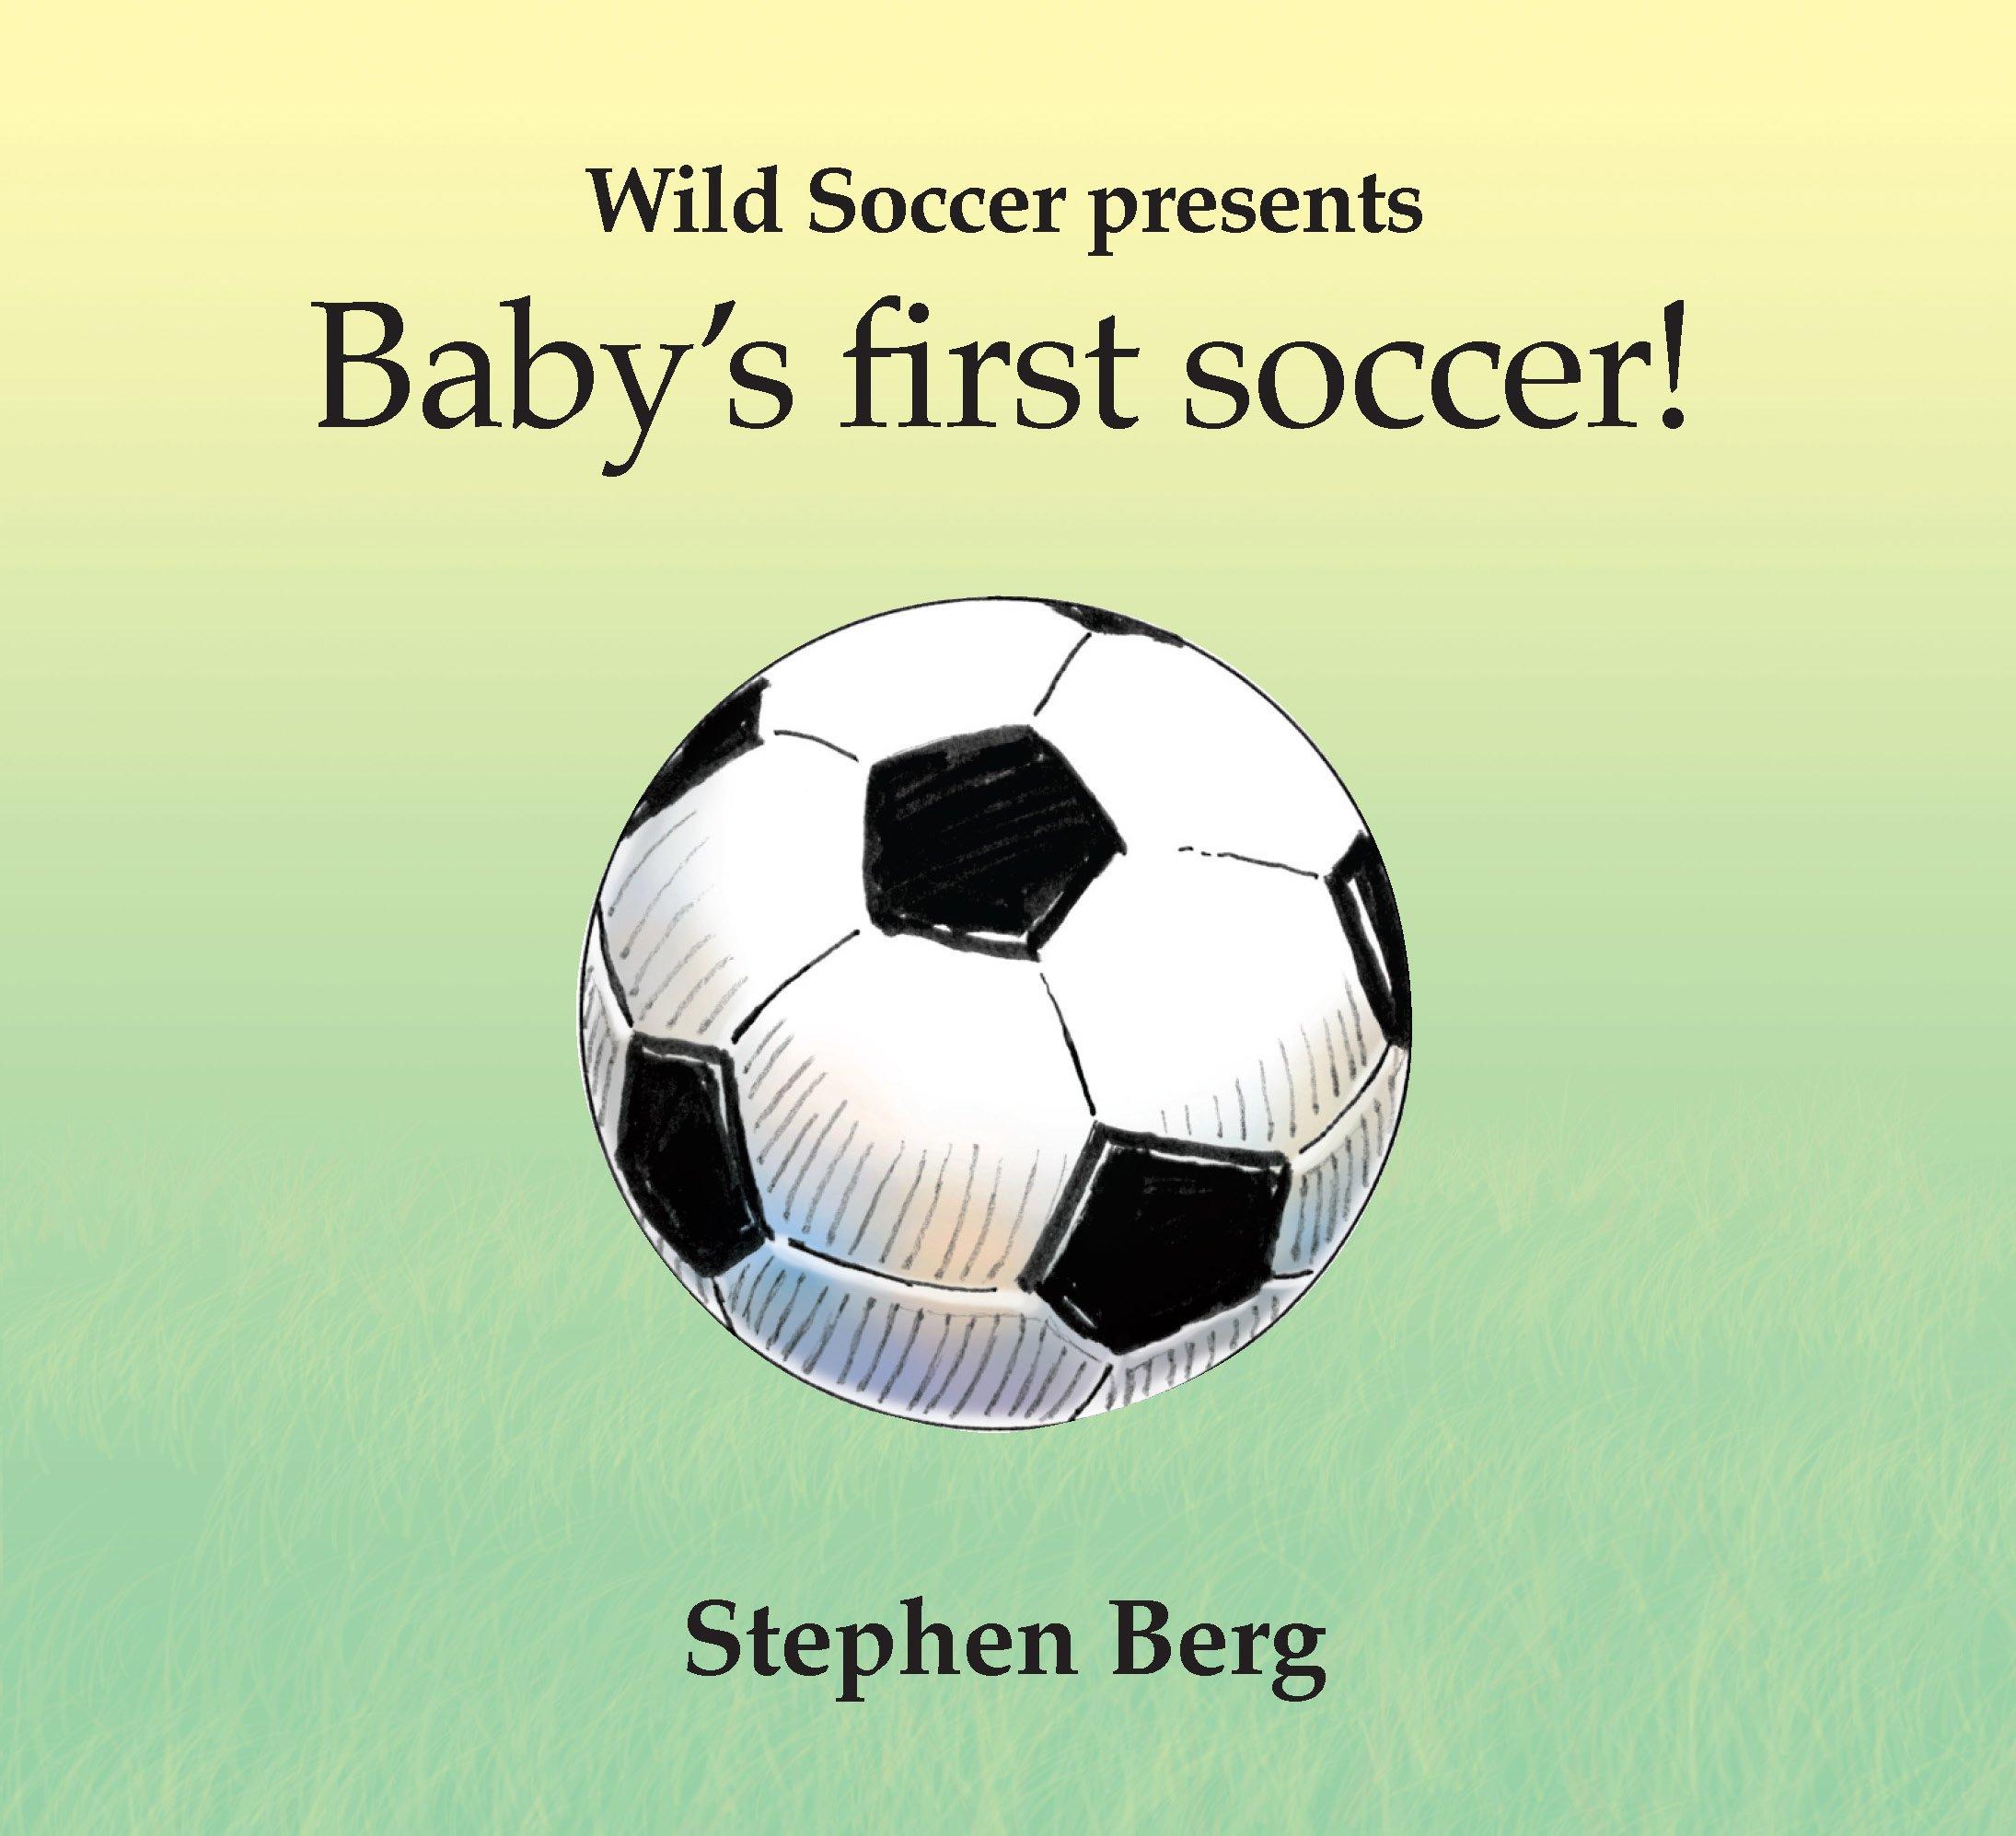 Baby's first soccer! (Wild Soccer): Stephen Berg, Gary Undercuffler:  9781938591020: Amazon.com: Books